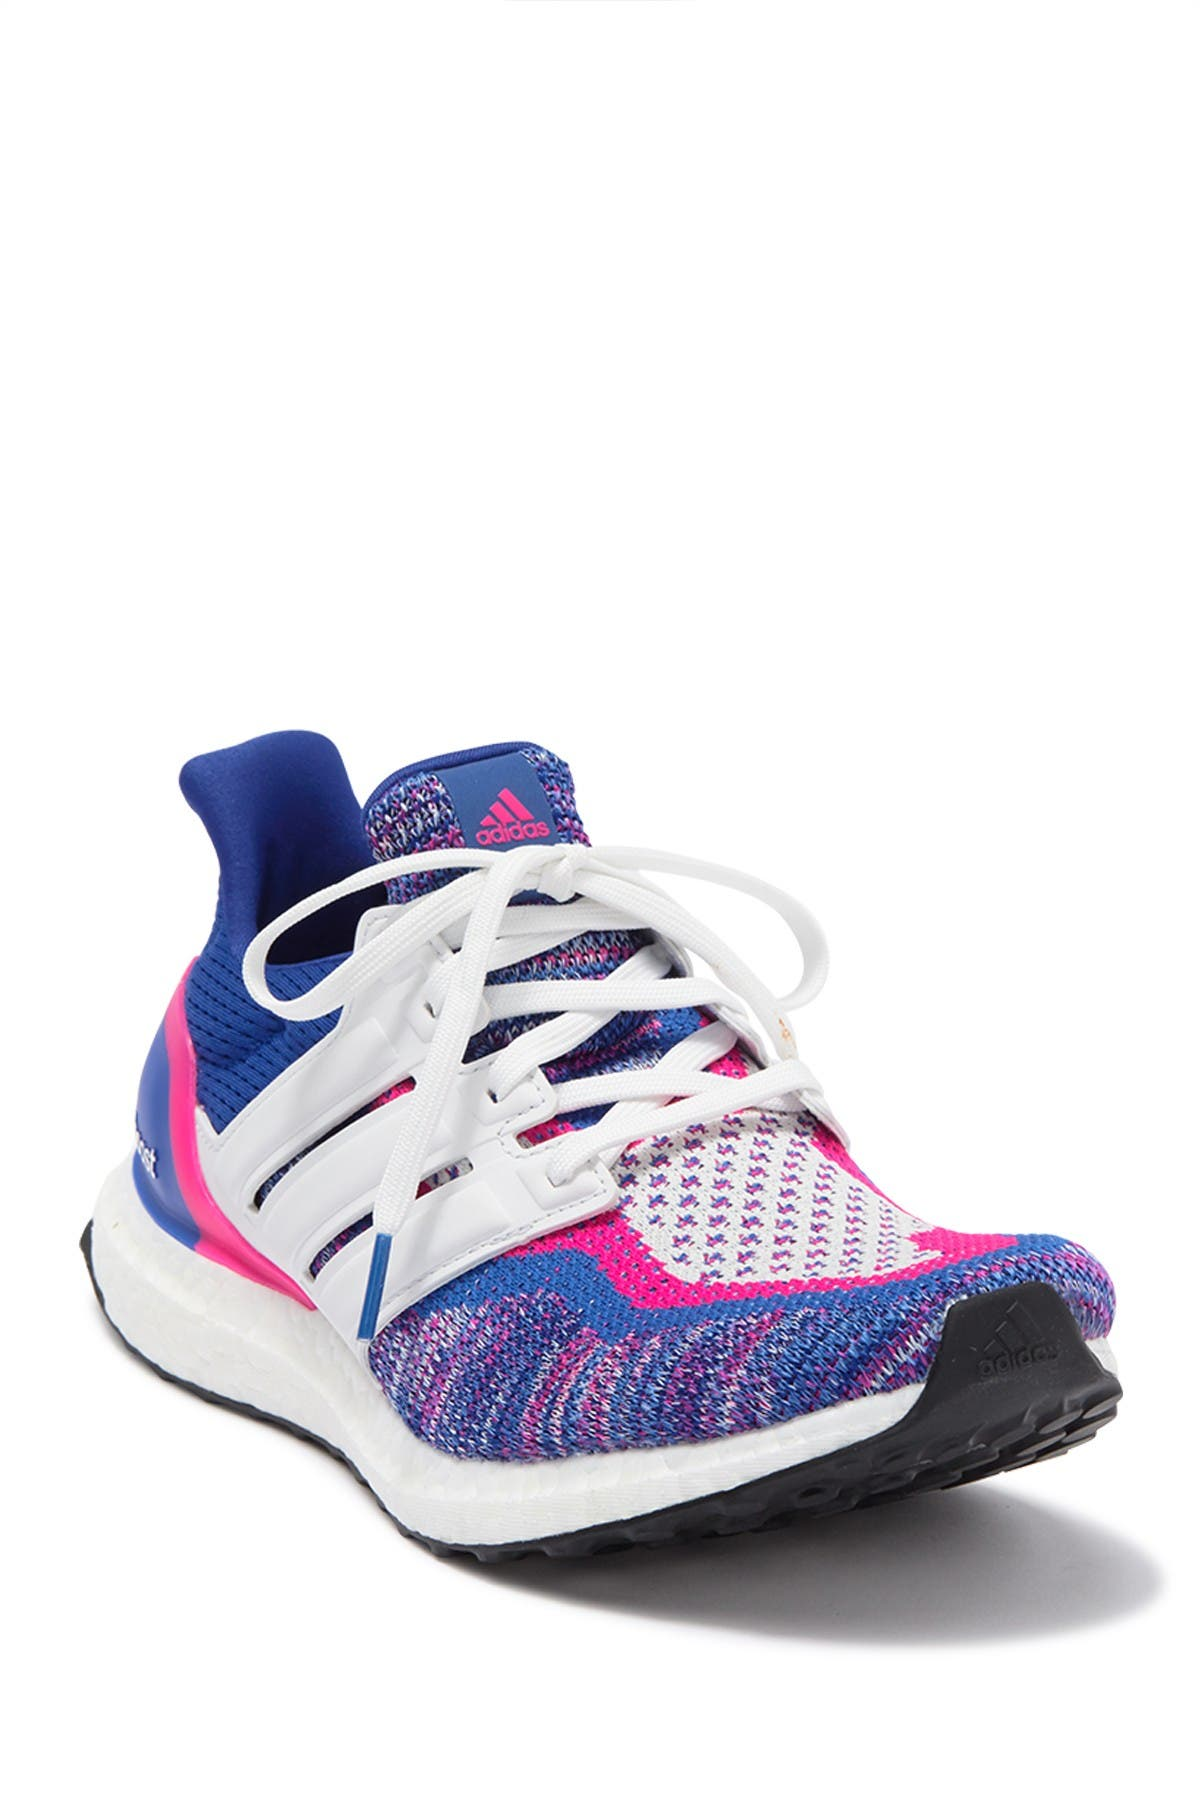 Image of adidas Ultraboost Multicolor Shoe